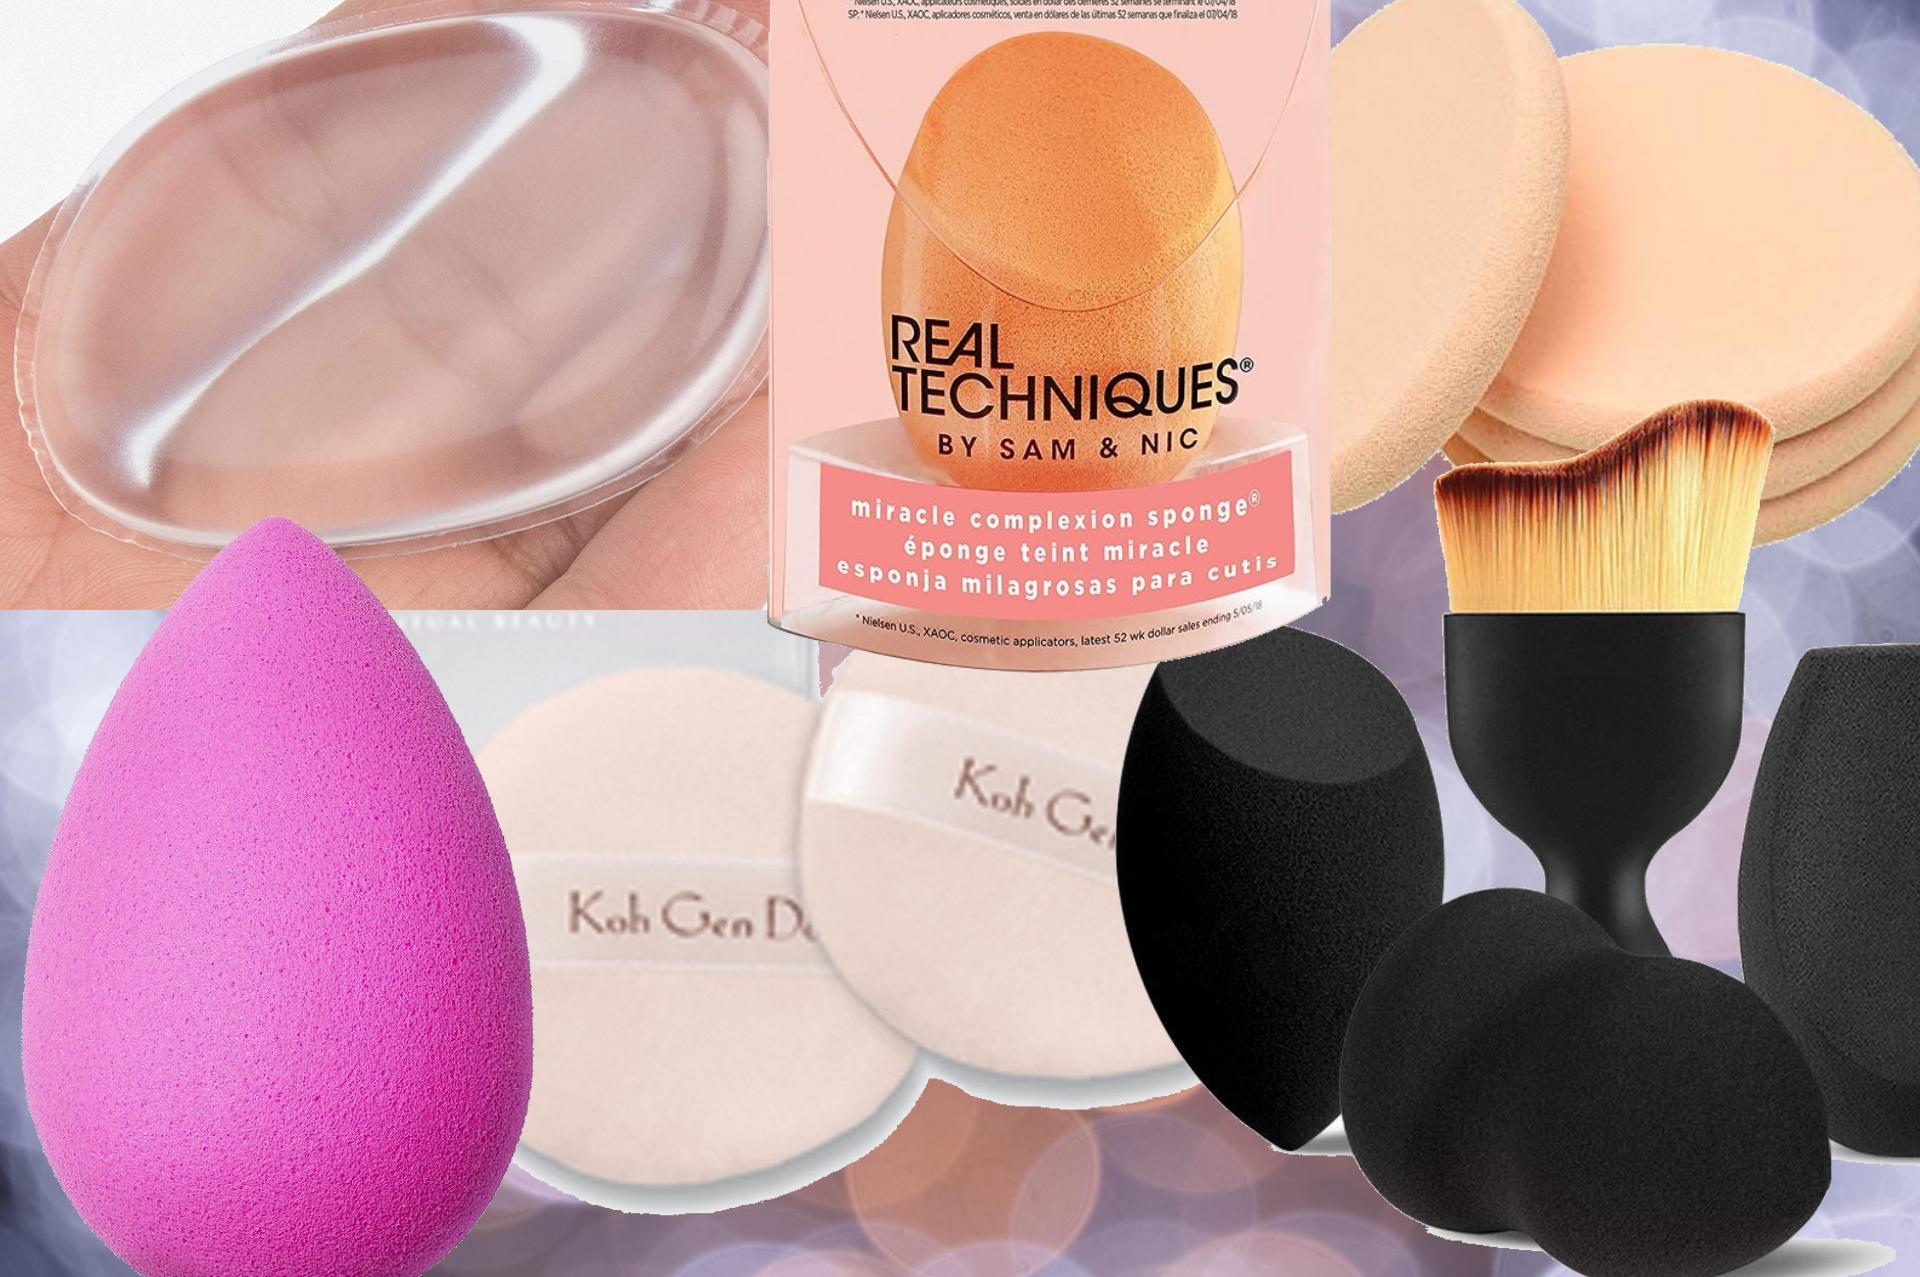 9 Best Makeup Sponges For Foundation In 2020